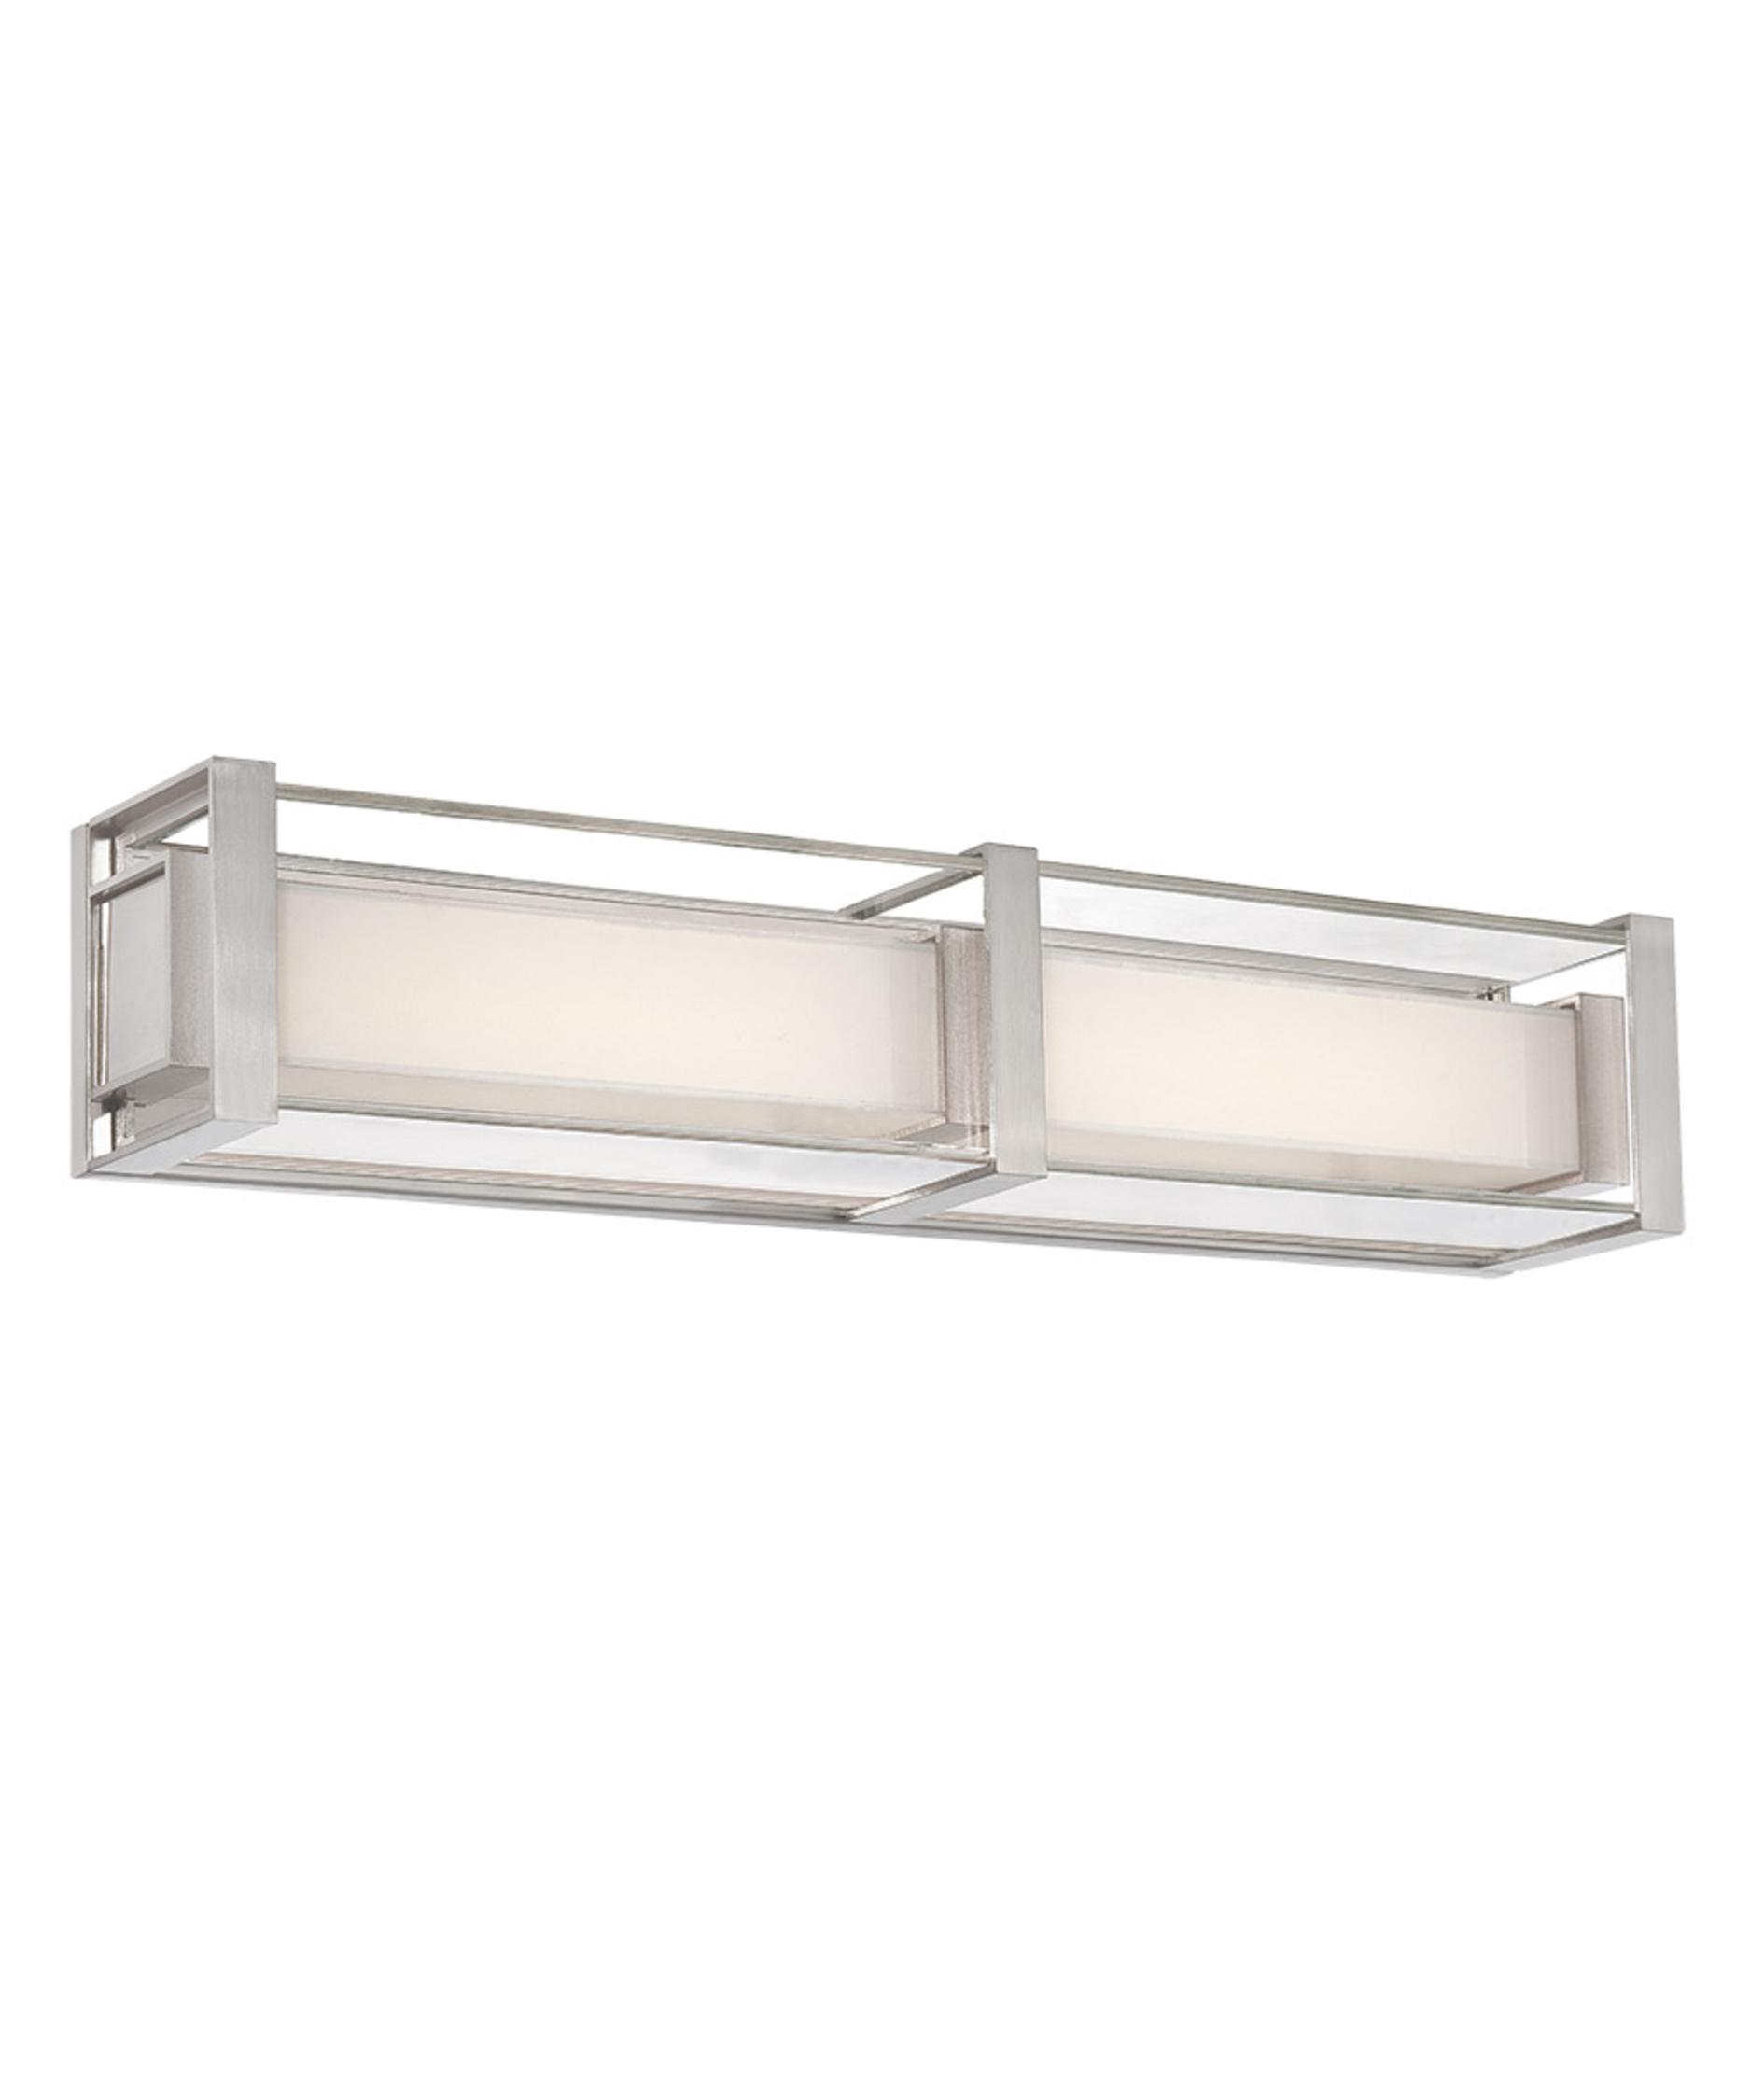 Bathroom vanity lights brushed nickel - Modern Forms Ws 6224 Sheridan 24 Inch Wide Bath Vanity Light Capitol Lighting 1 800lighting Com